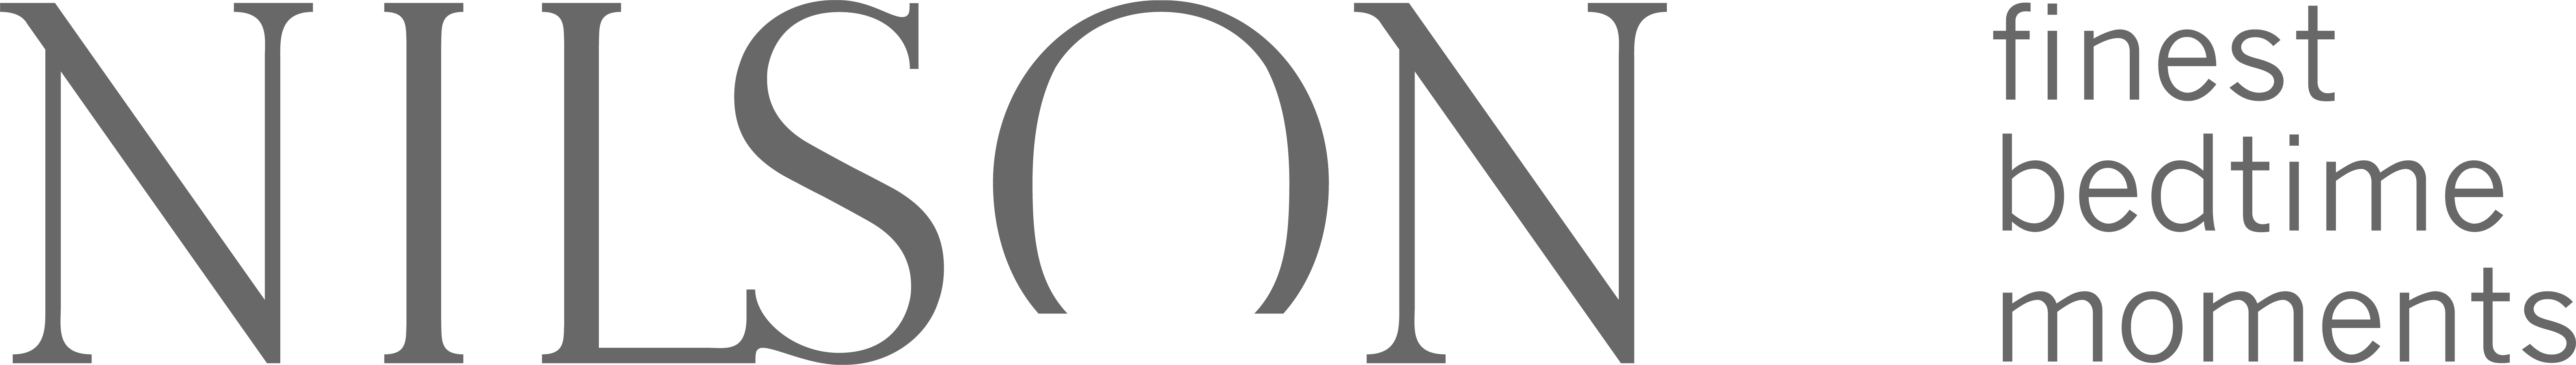 Nilson_logo_met payoff_RGB_1200dpi